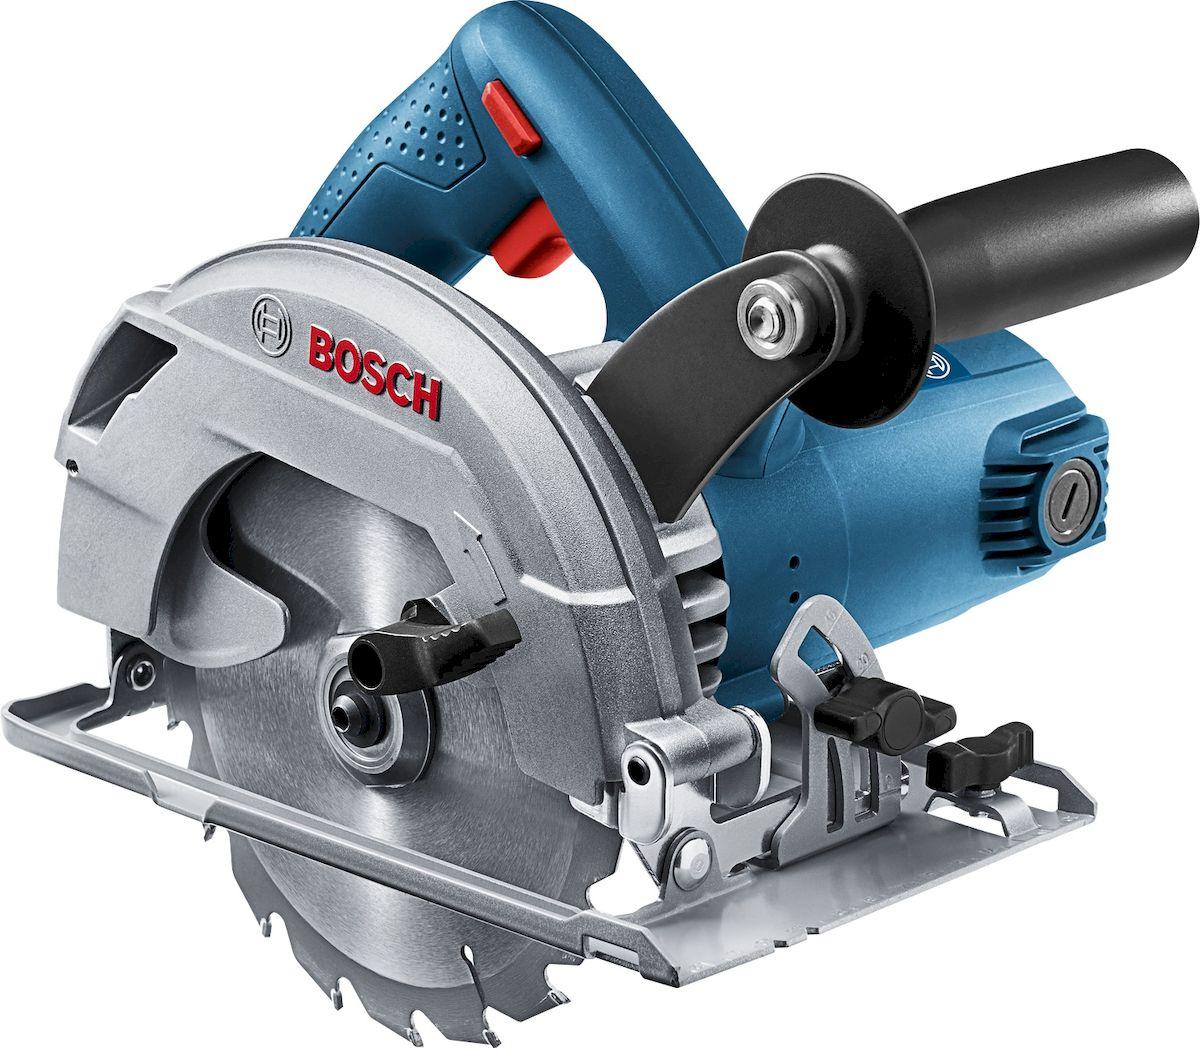 Циркулярная пила Bosch GKS 600. 06016A9020